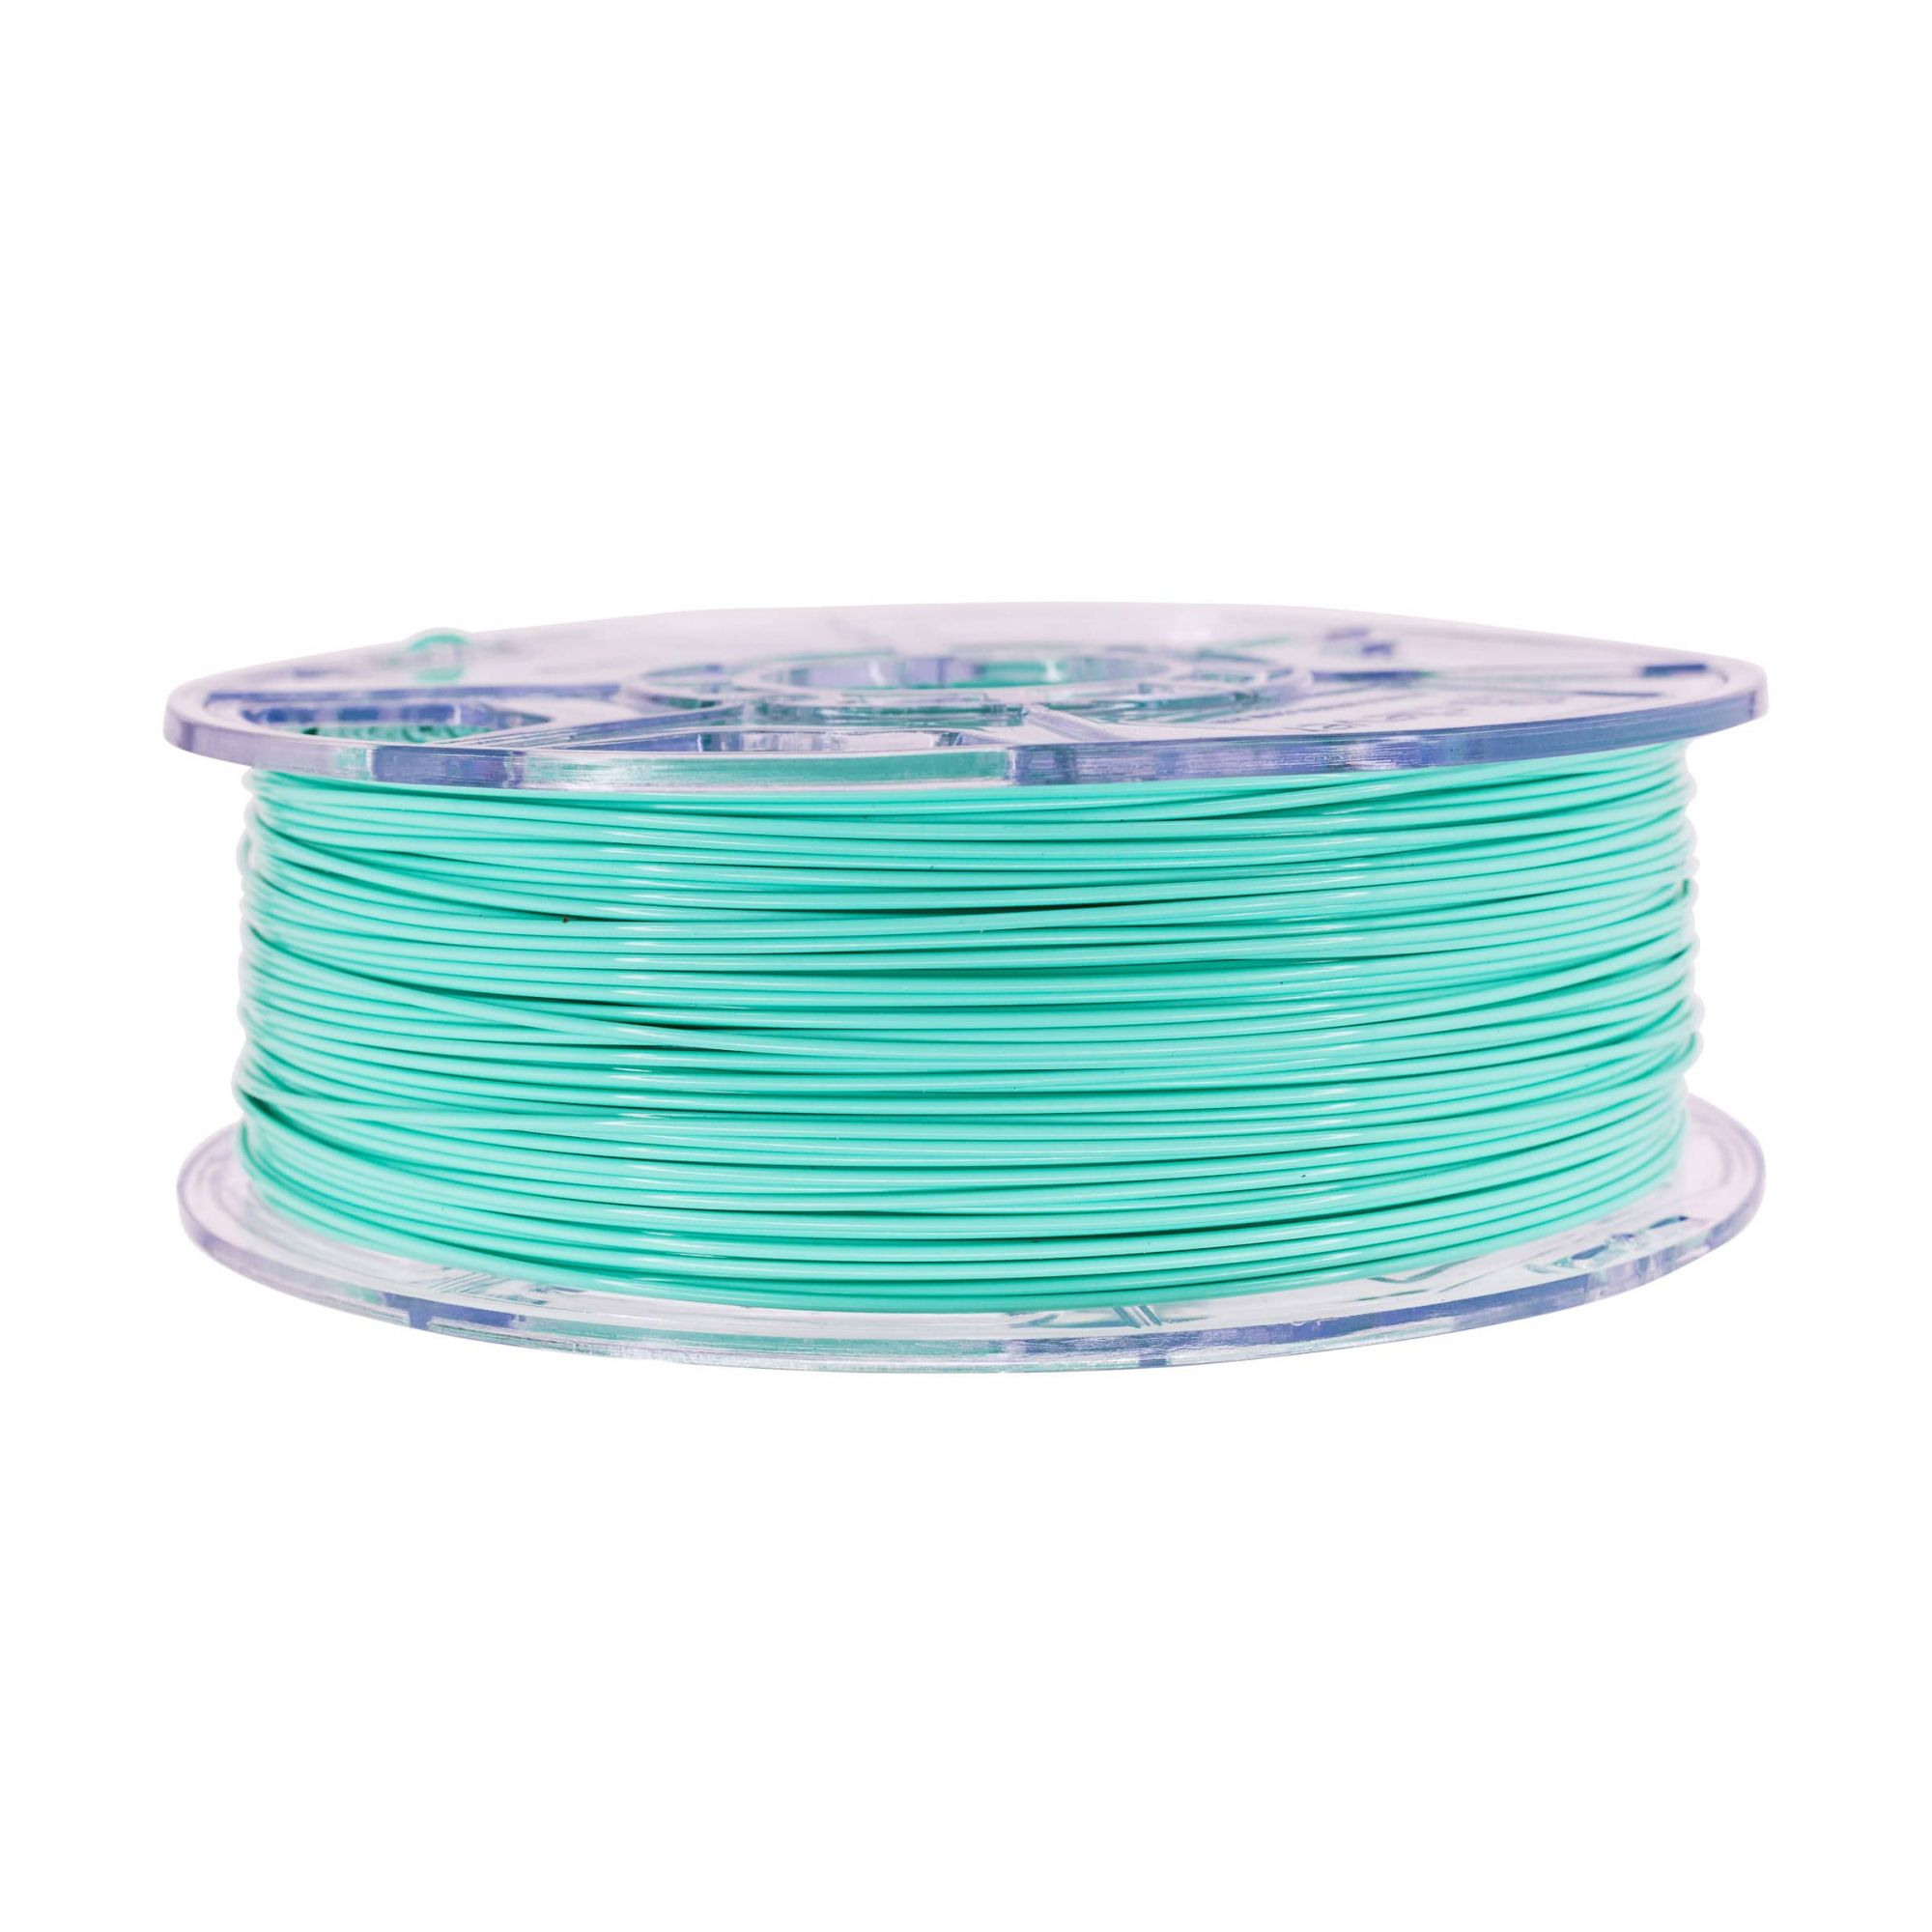 Filamento PLA - Verde Tiffany - Cliever - 1.75mm - 1kg